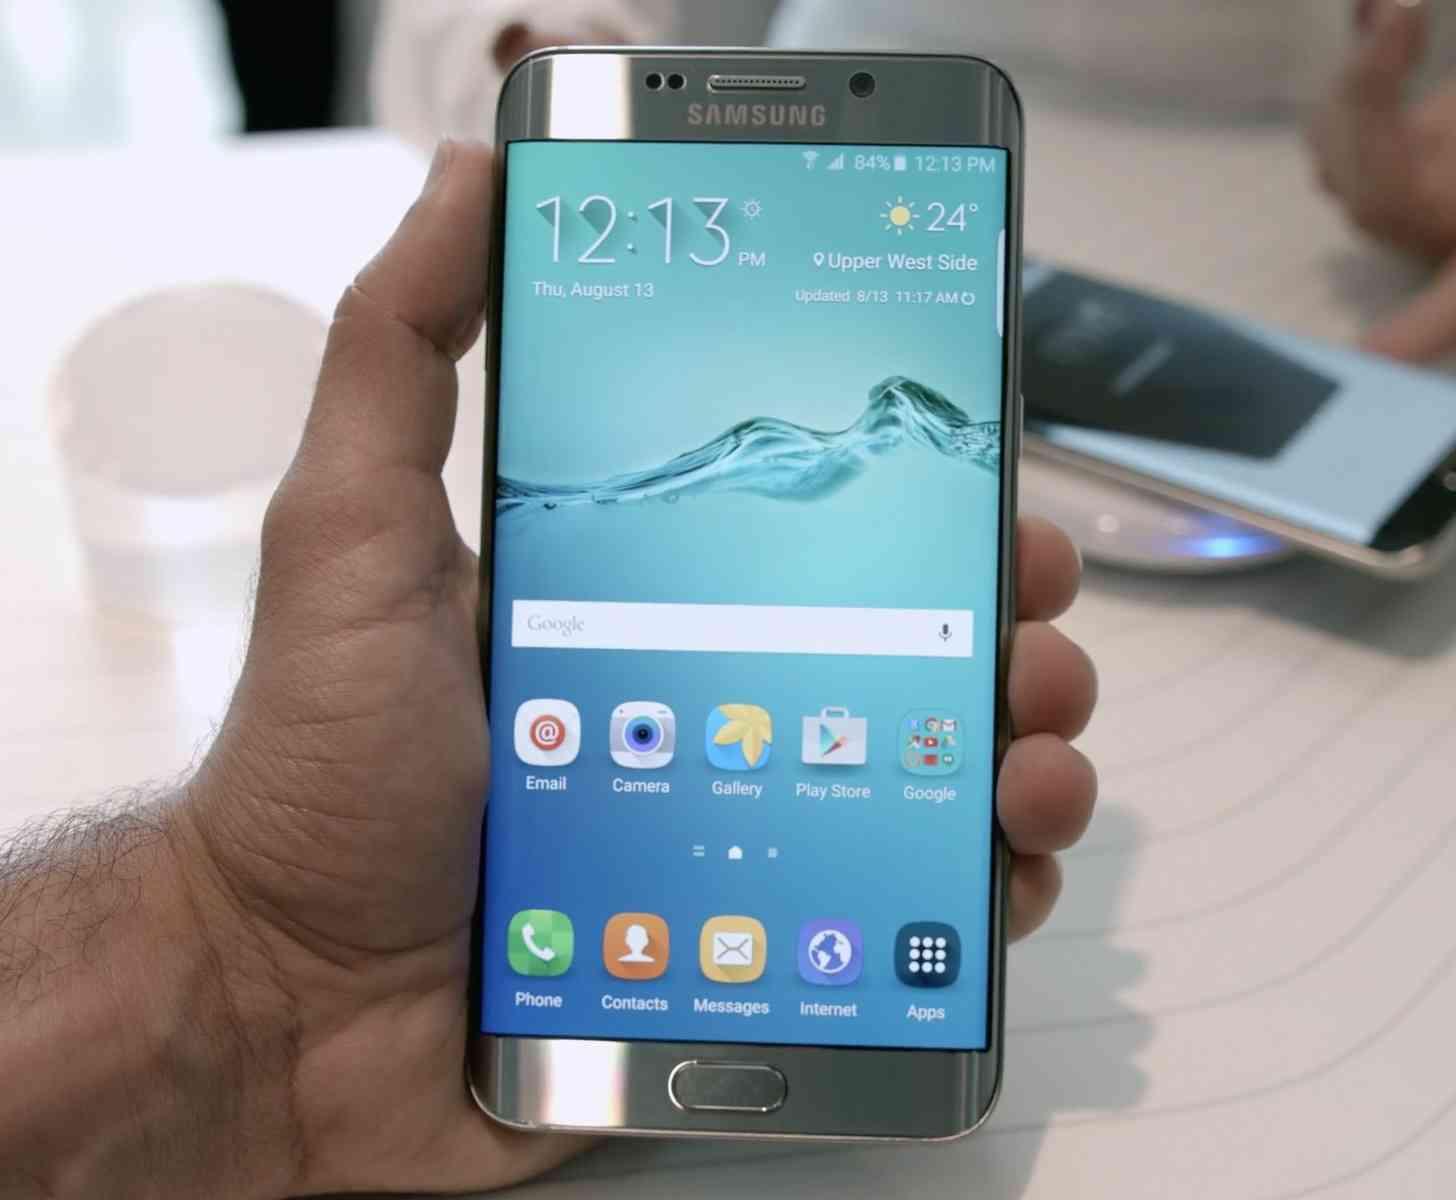 Samsung Galaxy S6 edge+ hands-on video